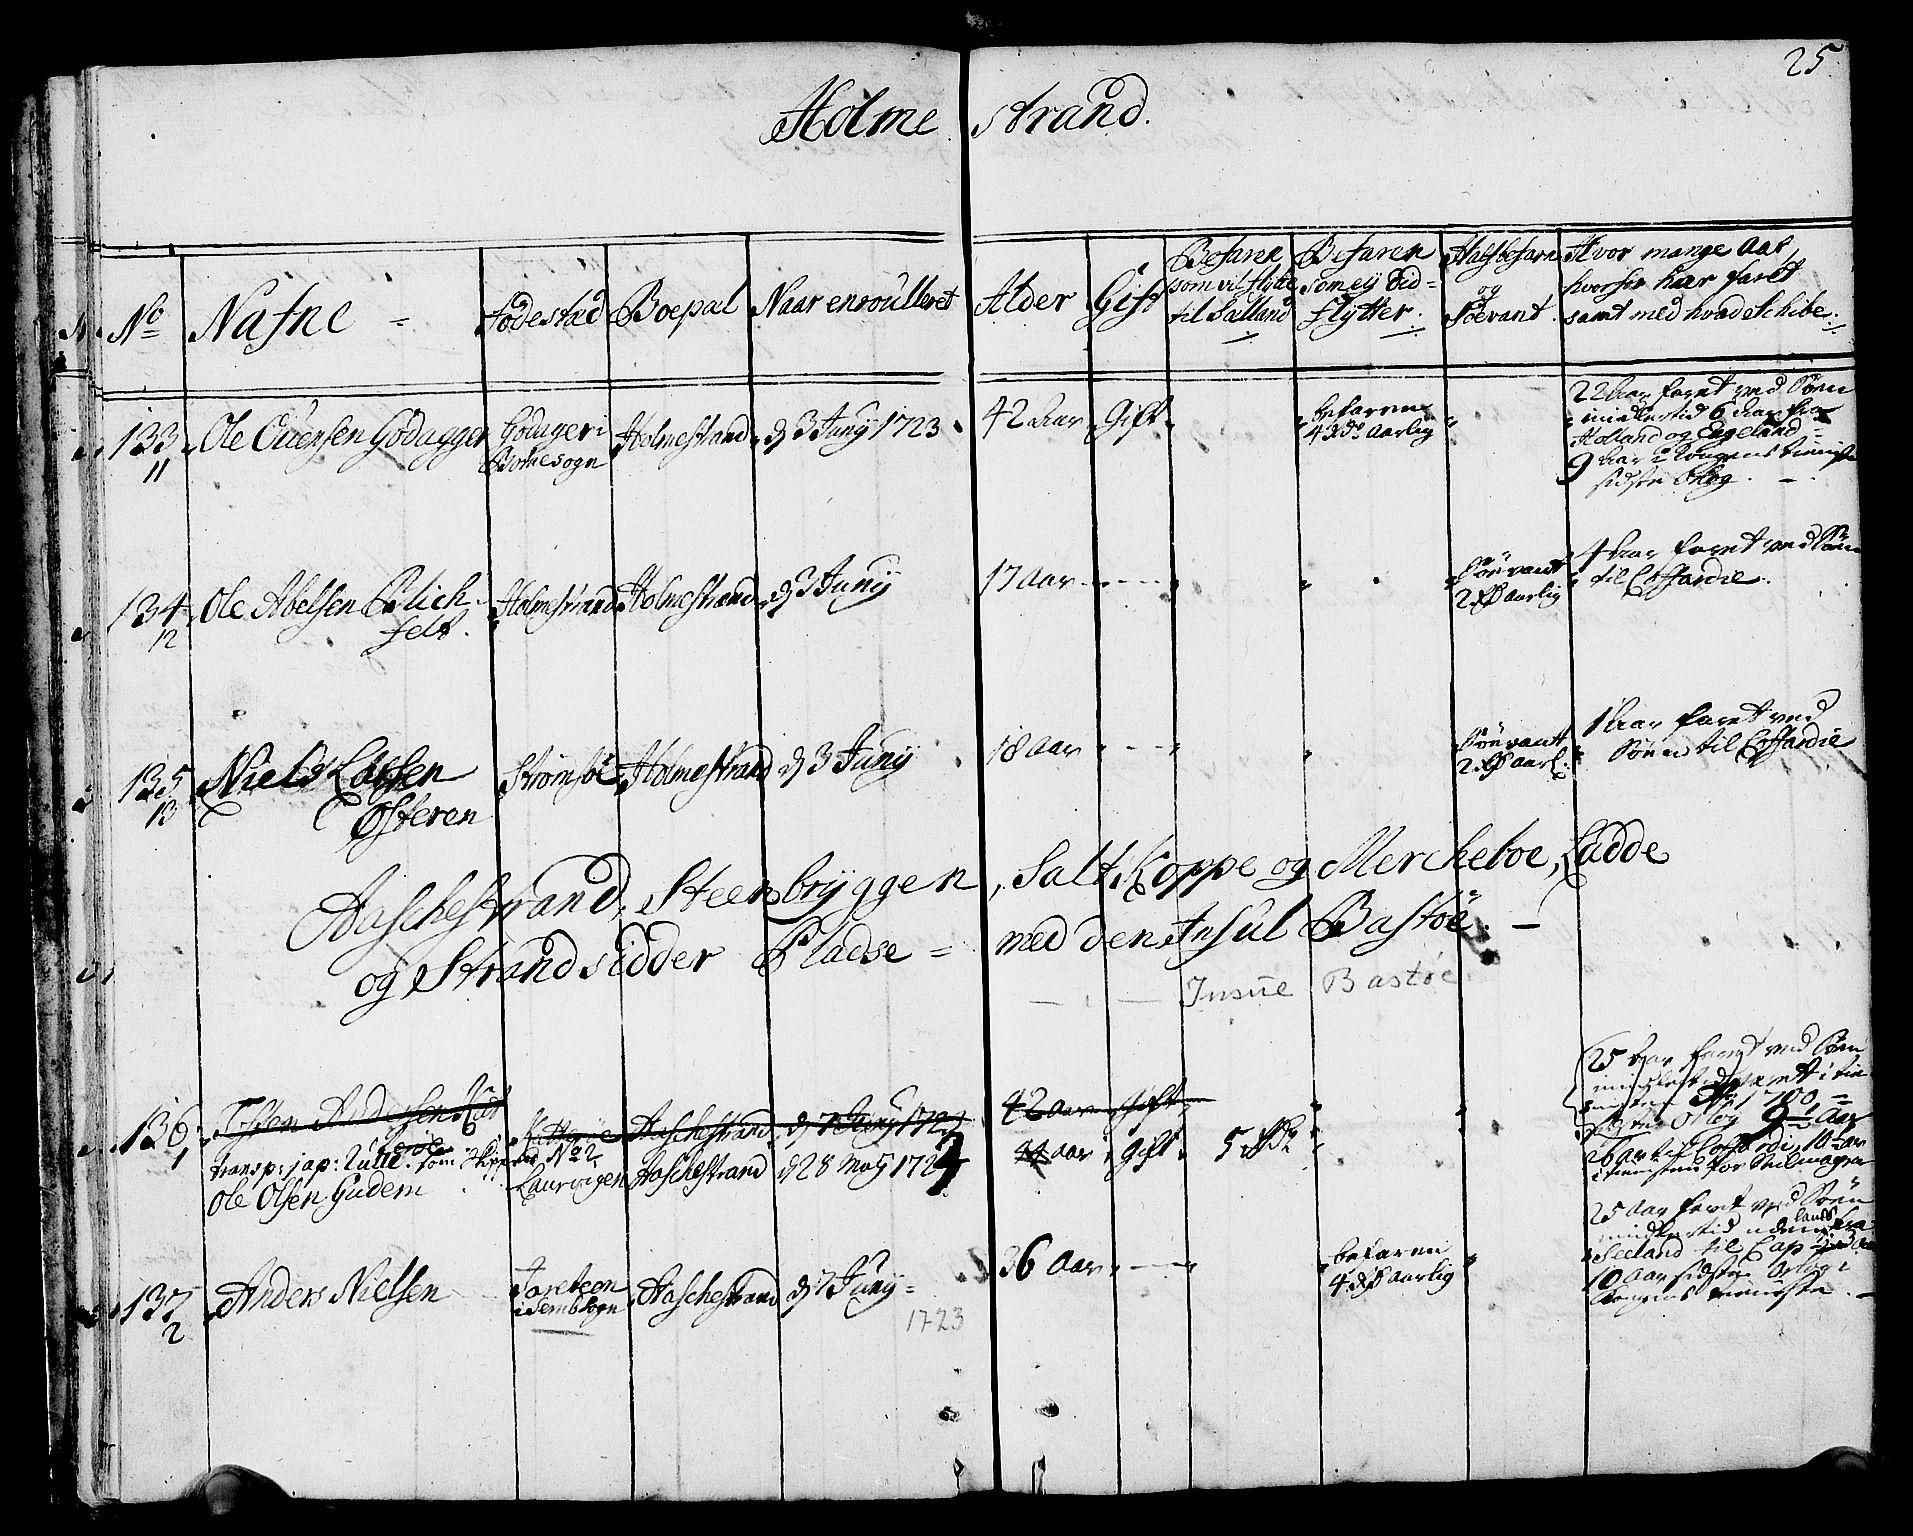 SAKO, Drammen innrulleringsdistrikt, F/Fa/L0002: Hovedrulle, 1723-1726, p. 26